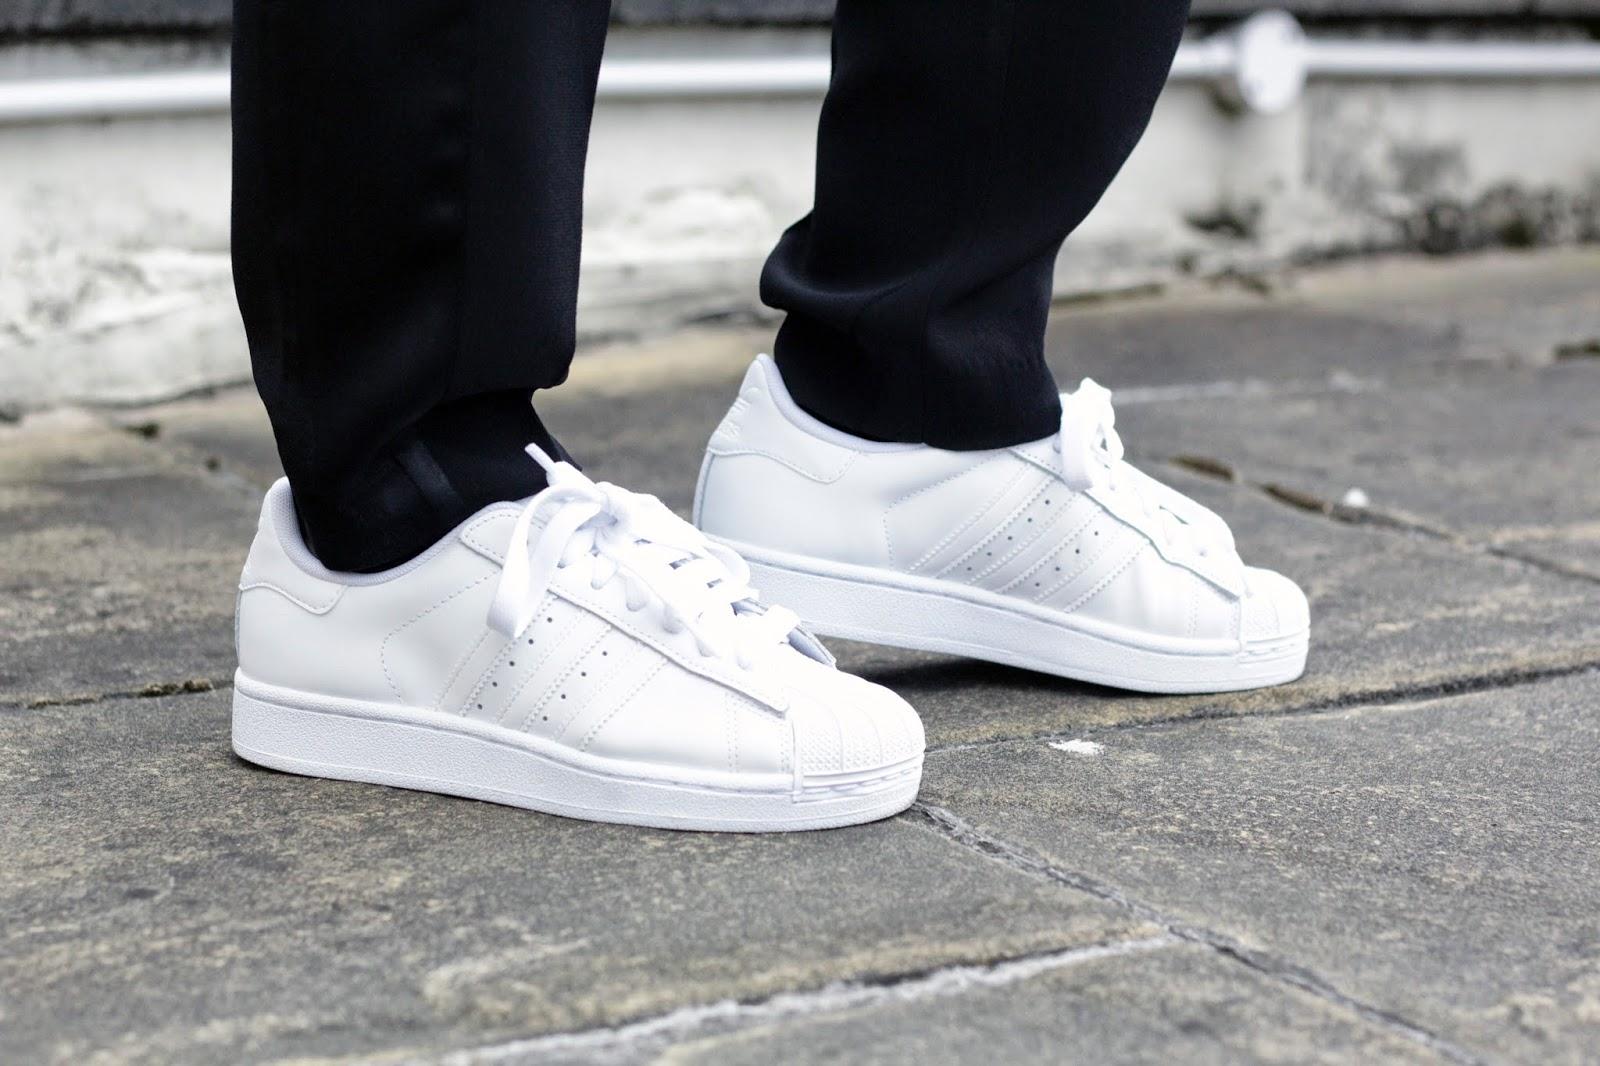 Adidas Originals Superstar II Street Style